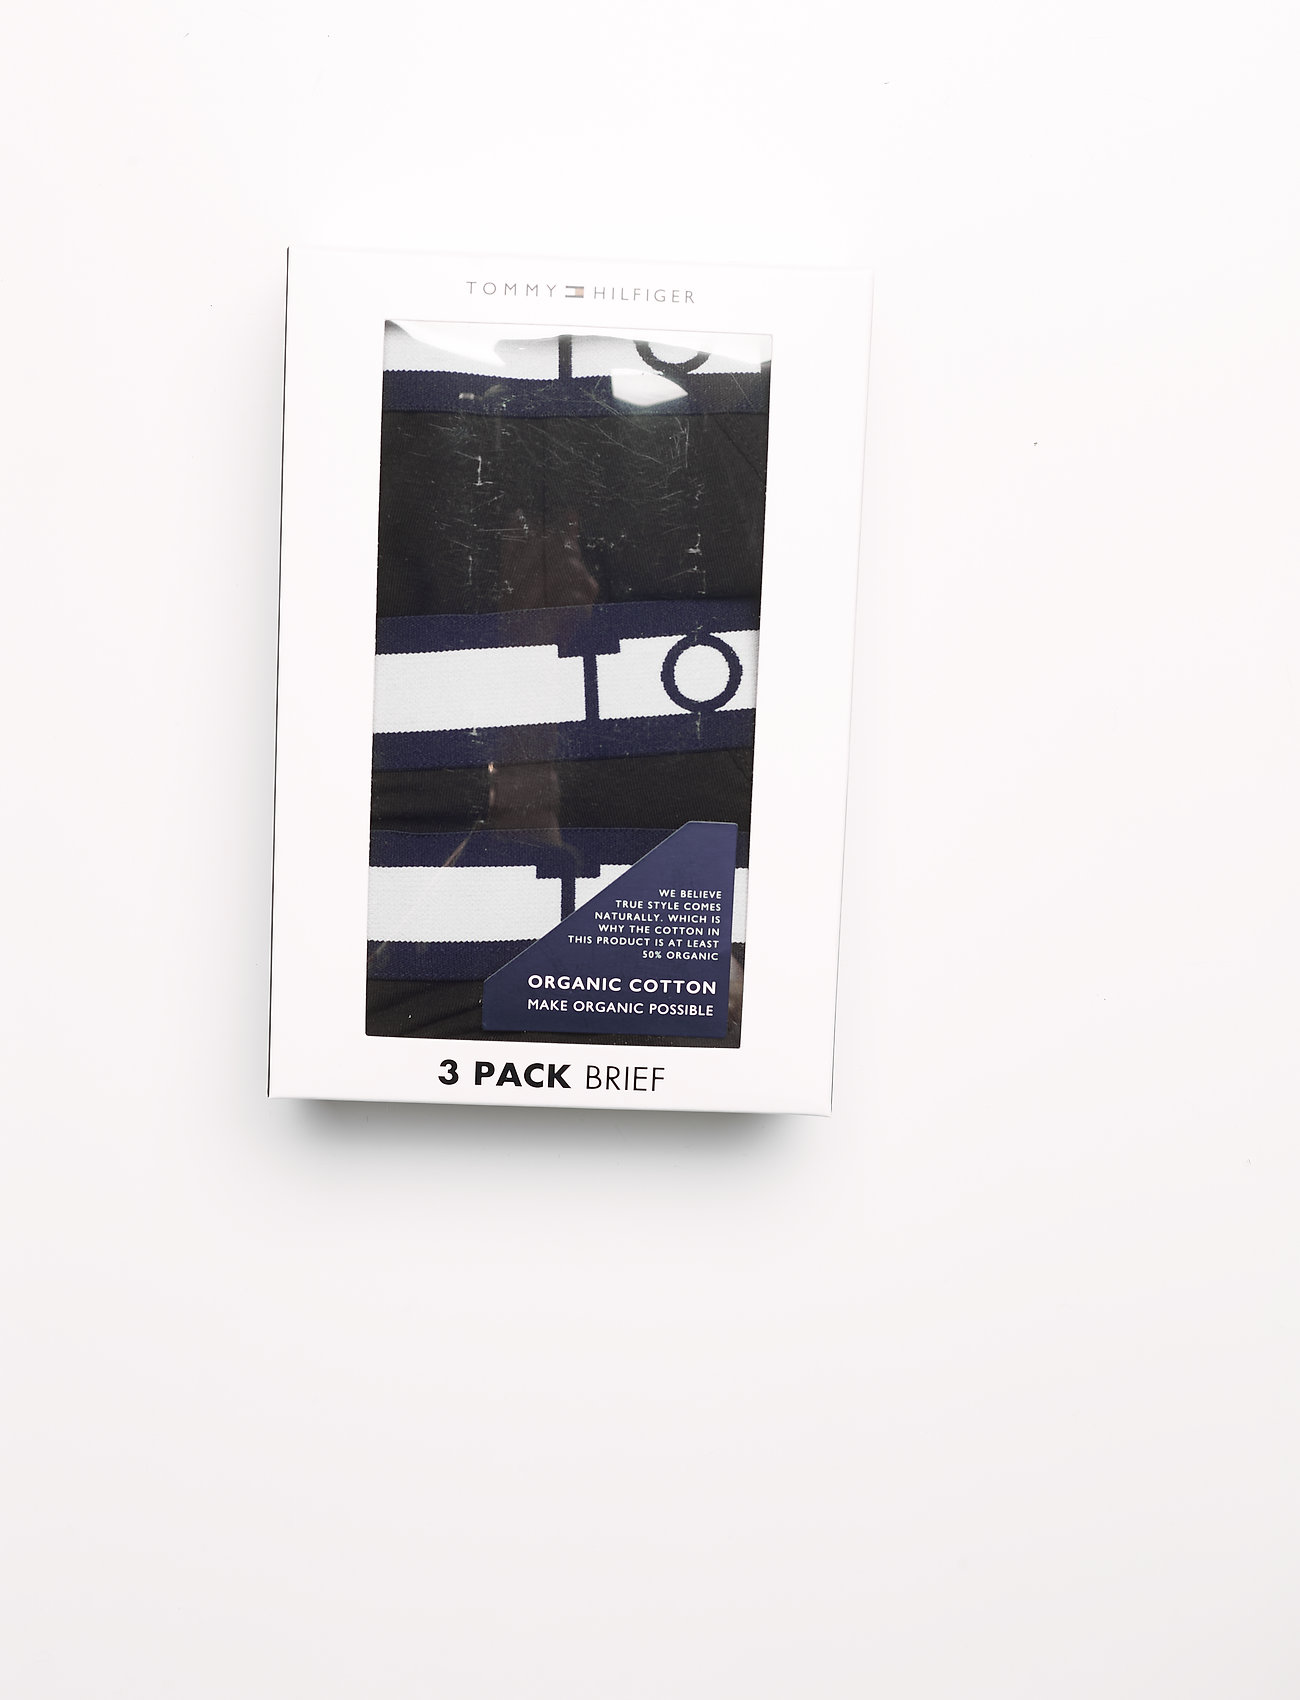 Tommy Hilfiger - 3P BRIEF - sous-vêtements - pvhblack/pvhblack/pvhblack - 2